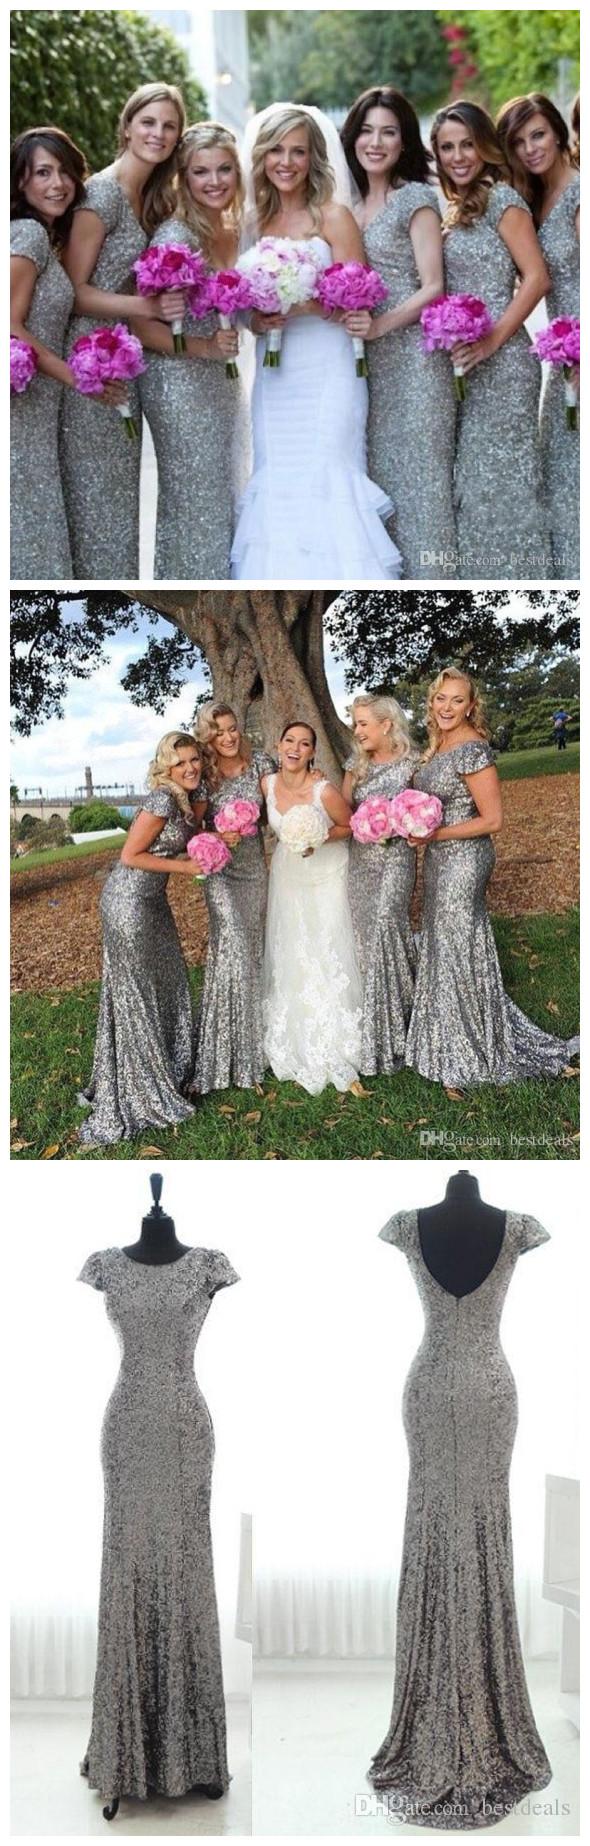 Gray sequin bridesmaid dress long bridesmaid dress cap sleeves gray sequin bridesmaid dress long bridesmaid dress cap sleeves bridesmaid dress popular bridesmaid dress ombrellifo Images